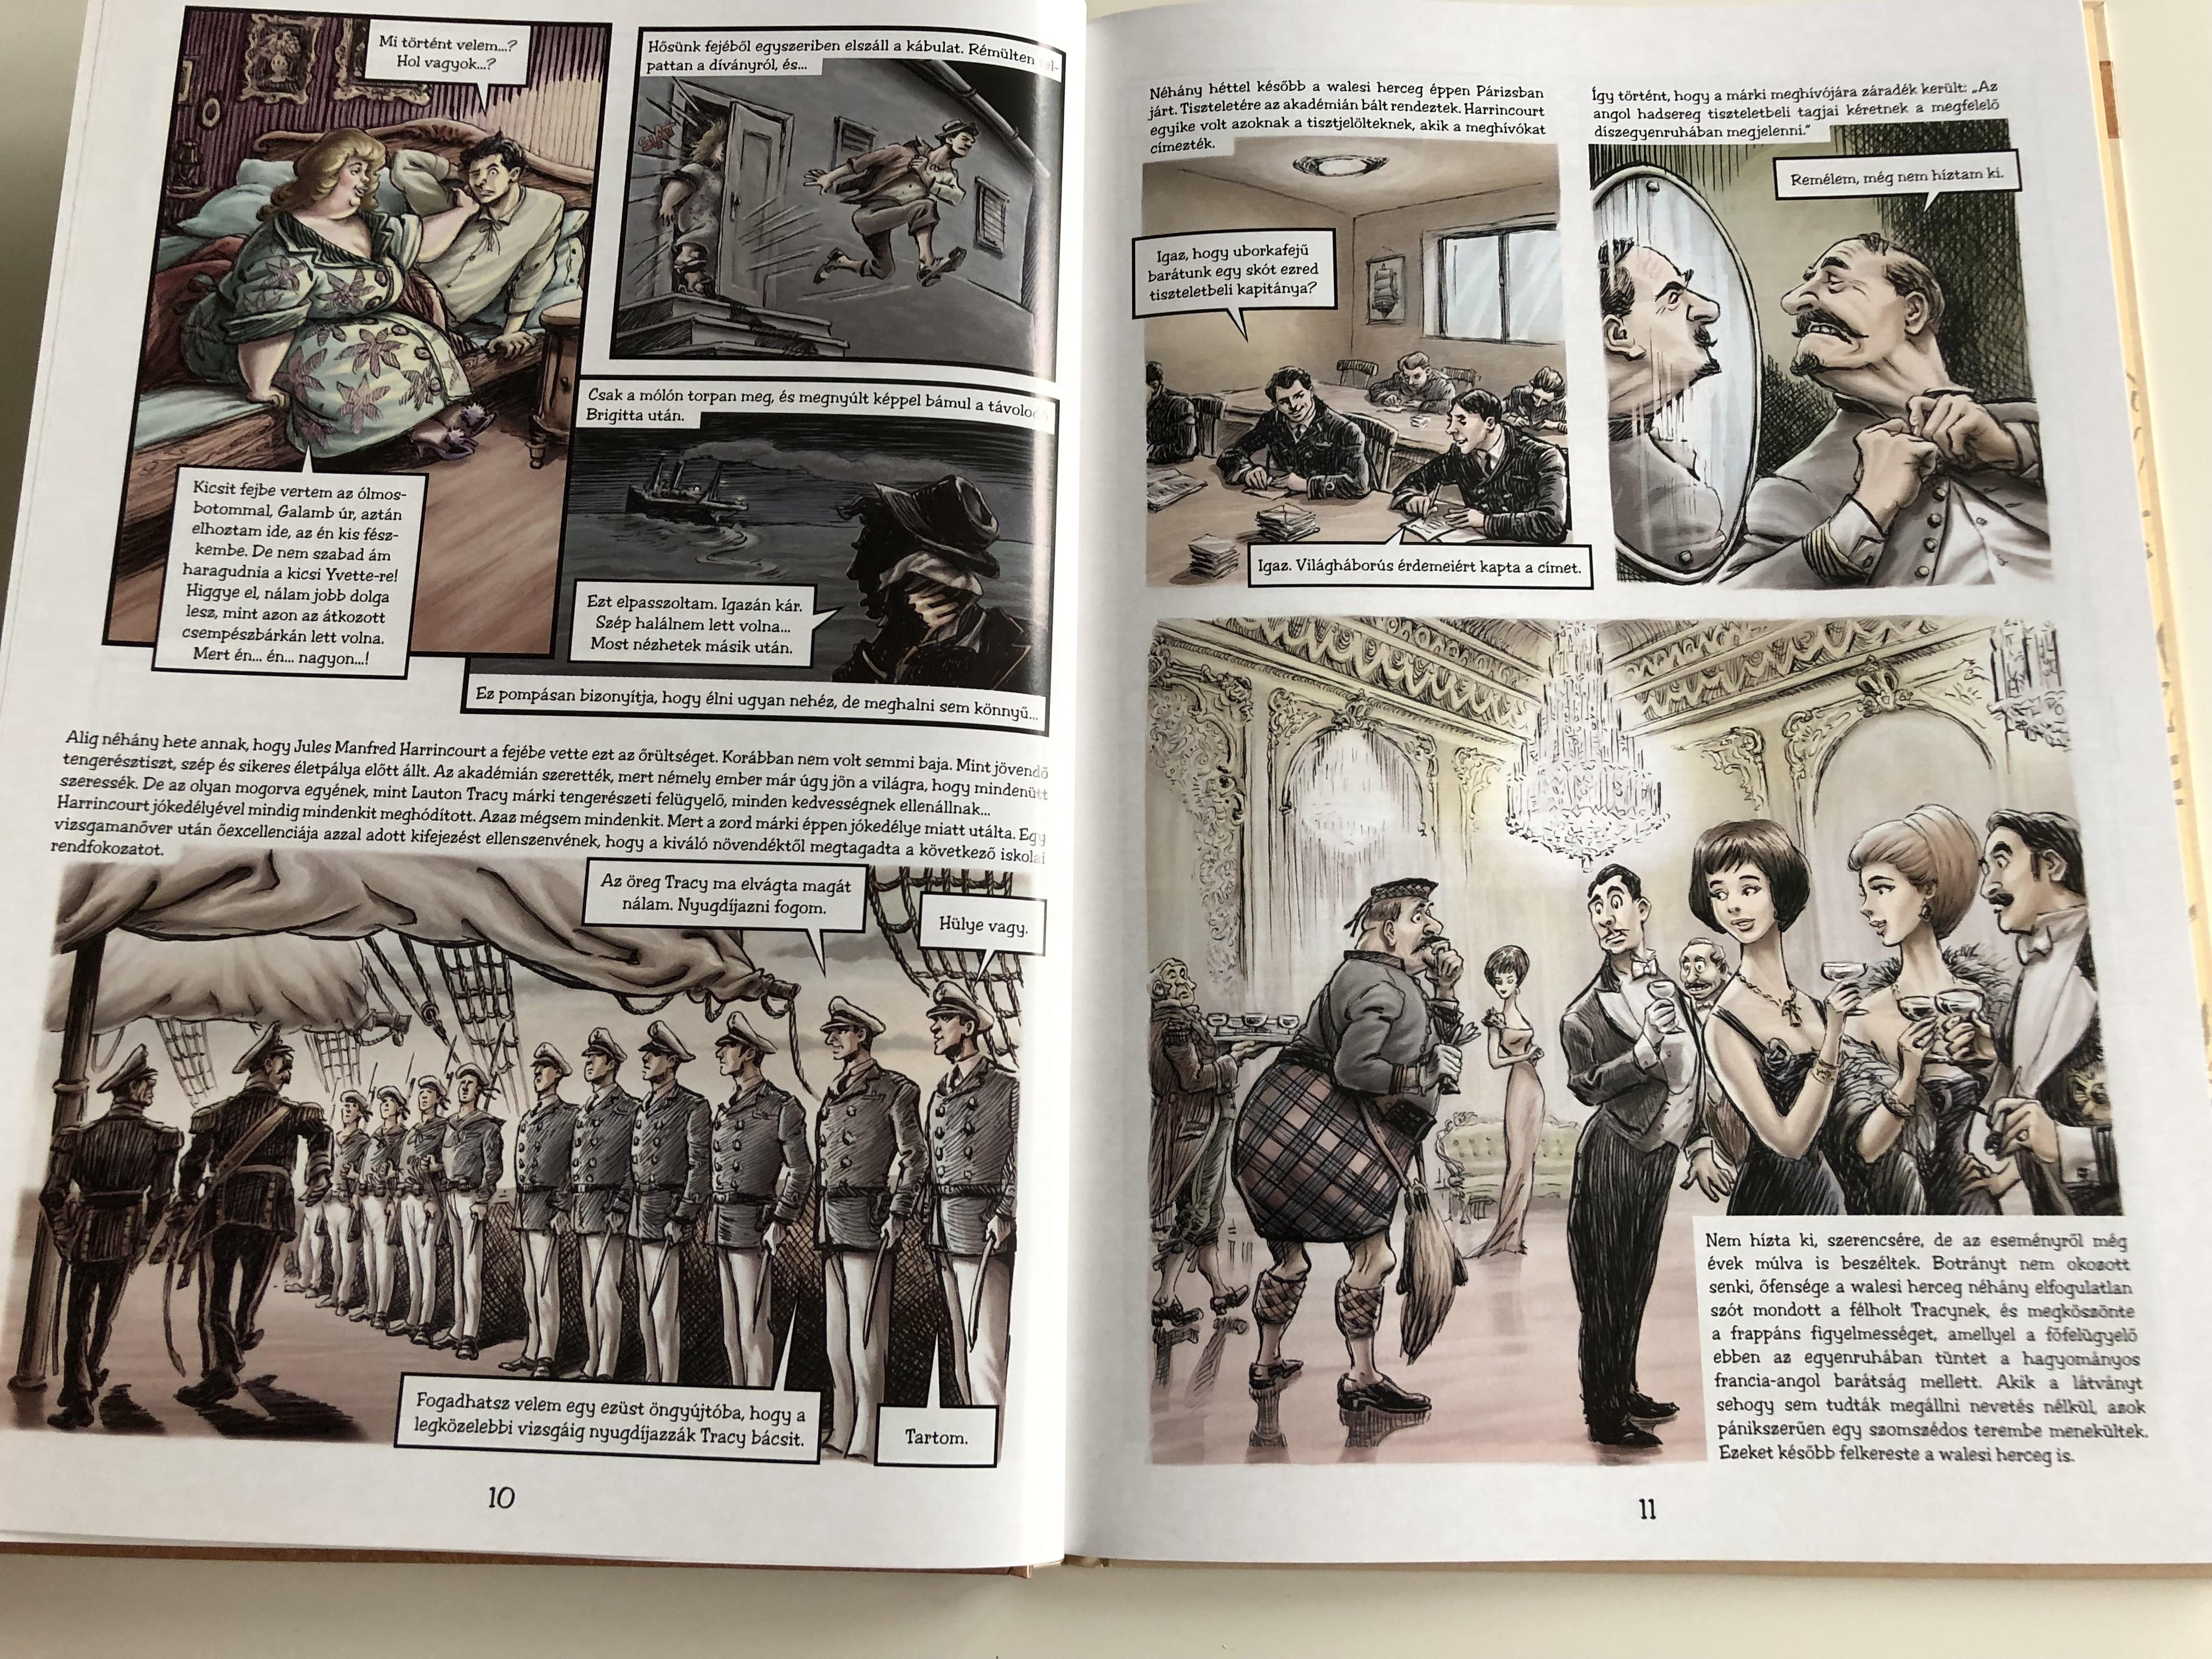 az-el-tretolt-hely-rs-g-by-rejt-jen-korcsm-ros-p-l-sz-nes-k-preg-ny-the-frontier-garrison-color-comic-book-hardcover-2013-3rd-edition-k-pes-kiad-4-.jpg